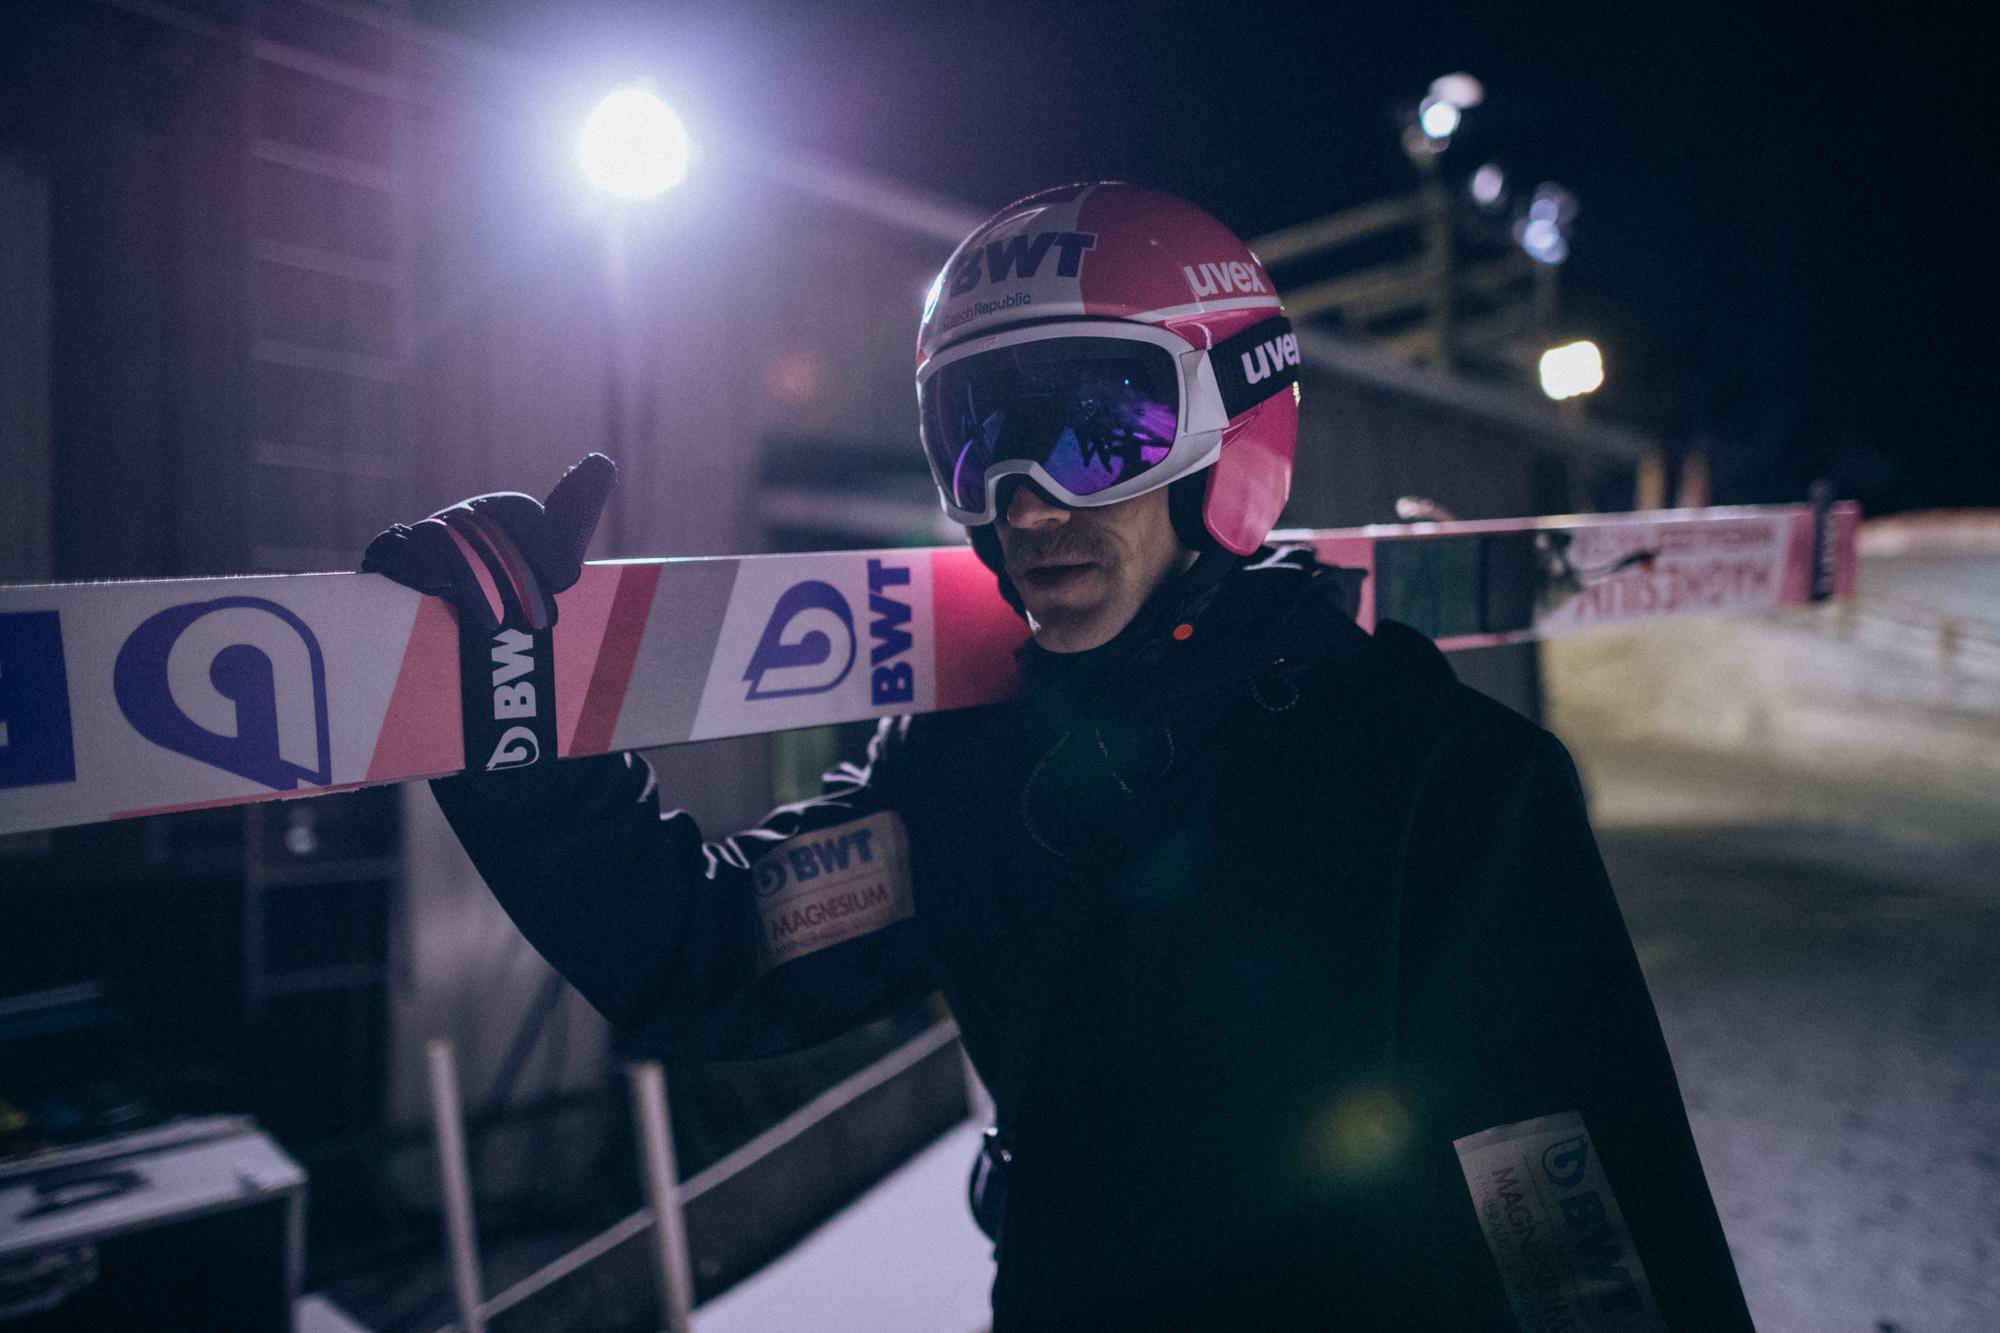 greta-horsch_bwt_ski-jumping_max-threlfall_7